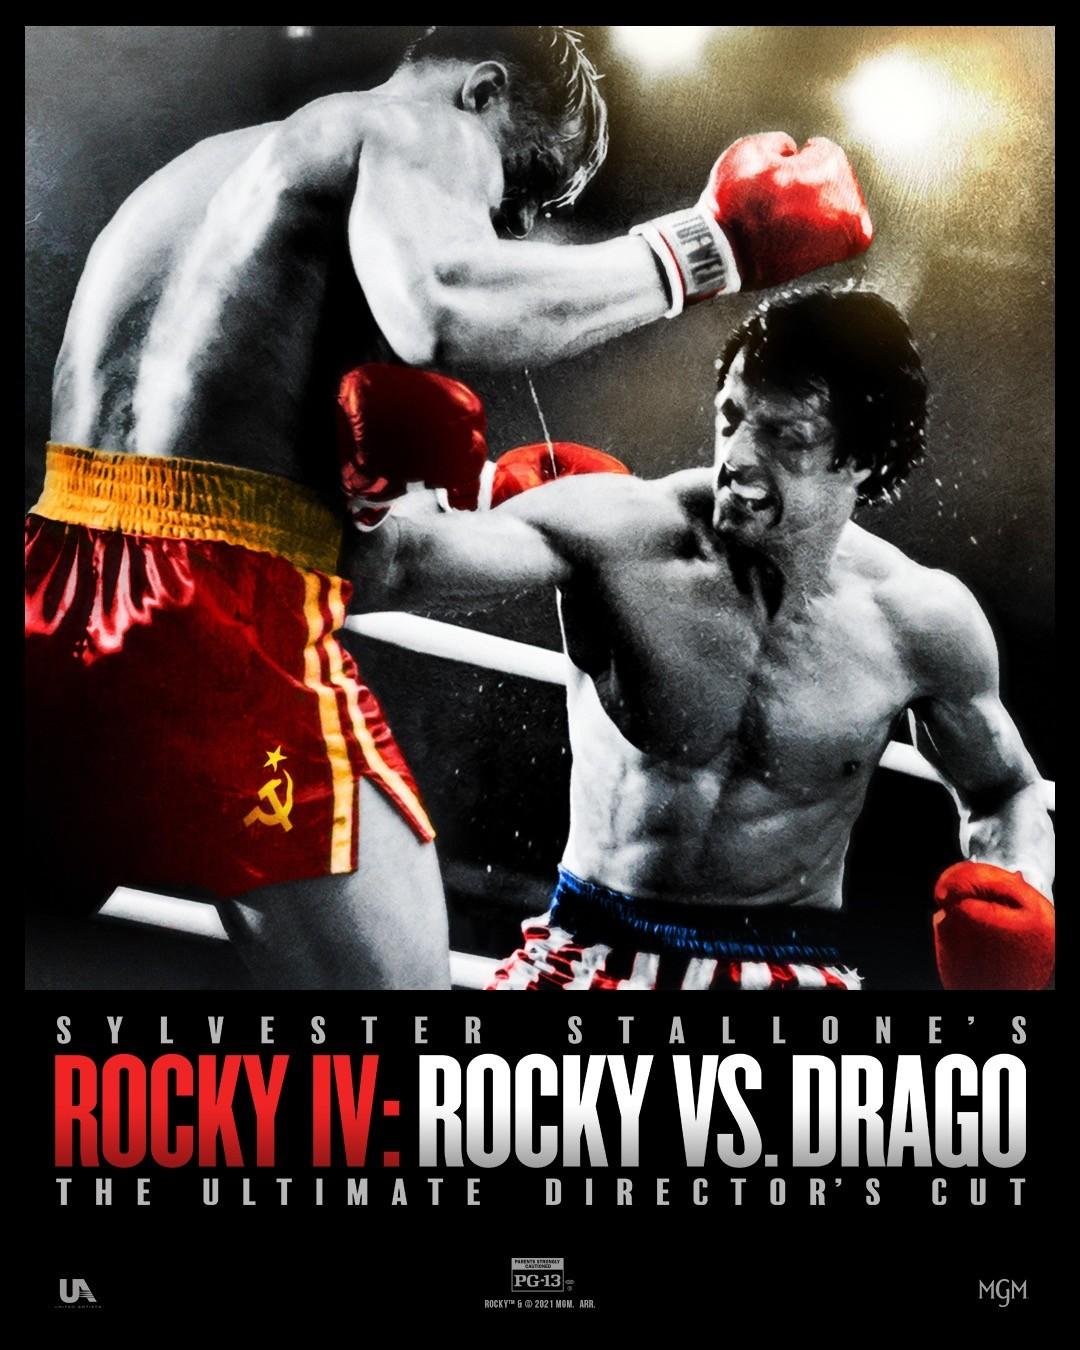 ROCKY IV : ROCKY VS DRAGO [Ultimate Director's Cut]